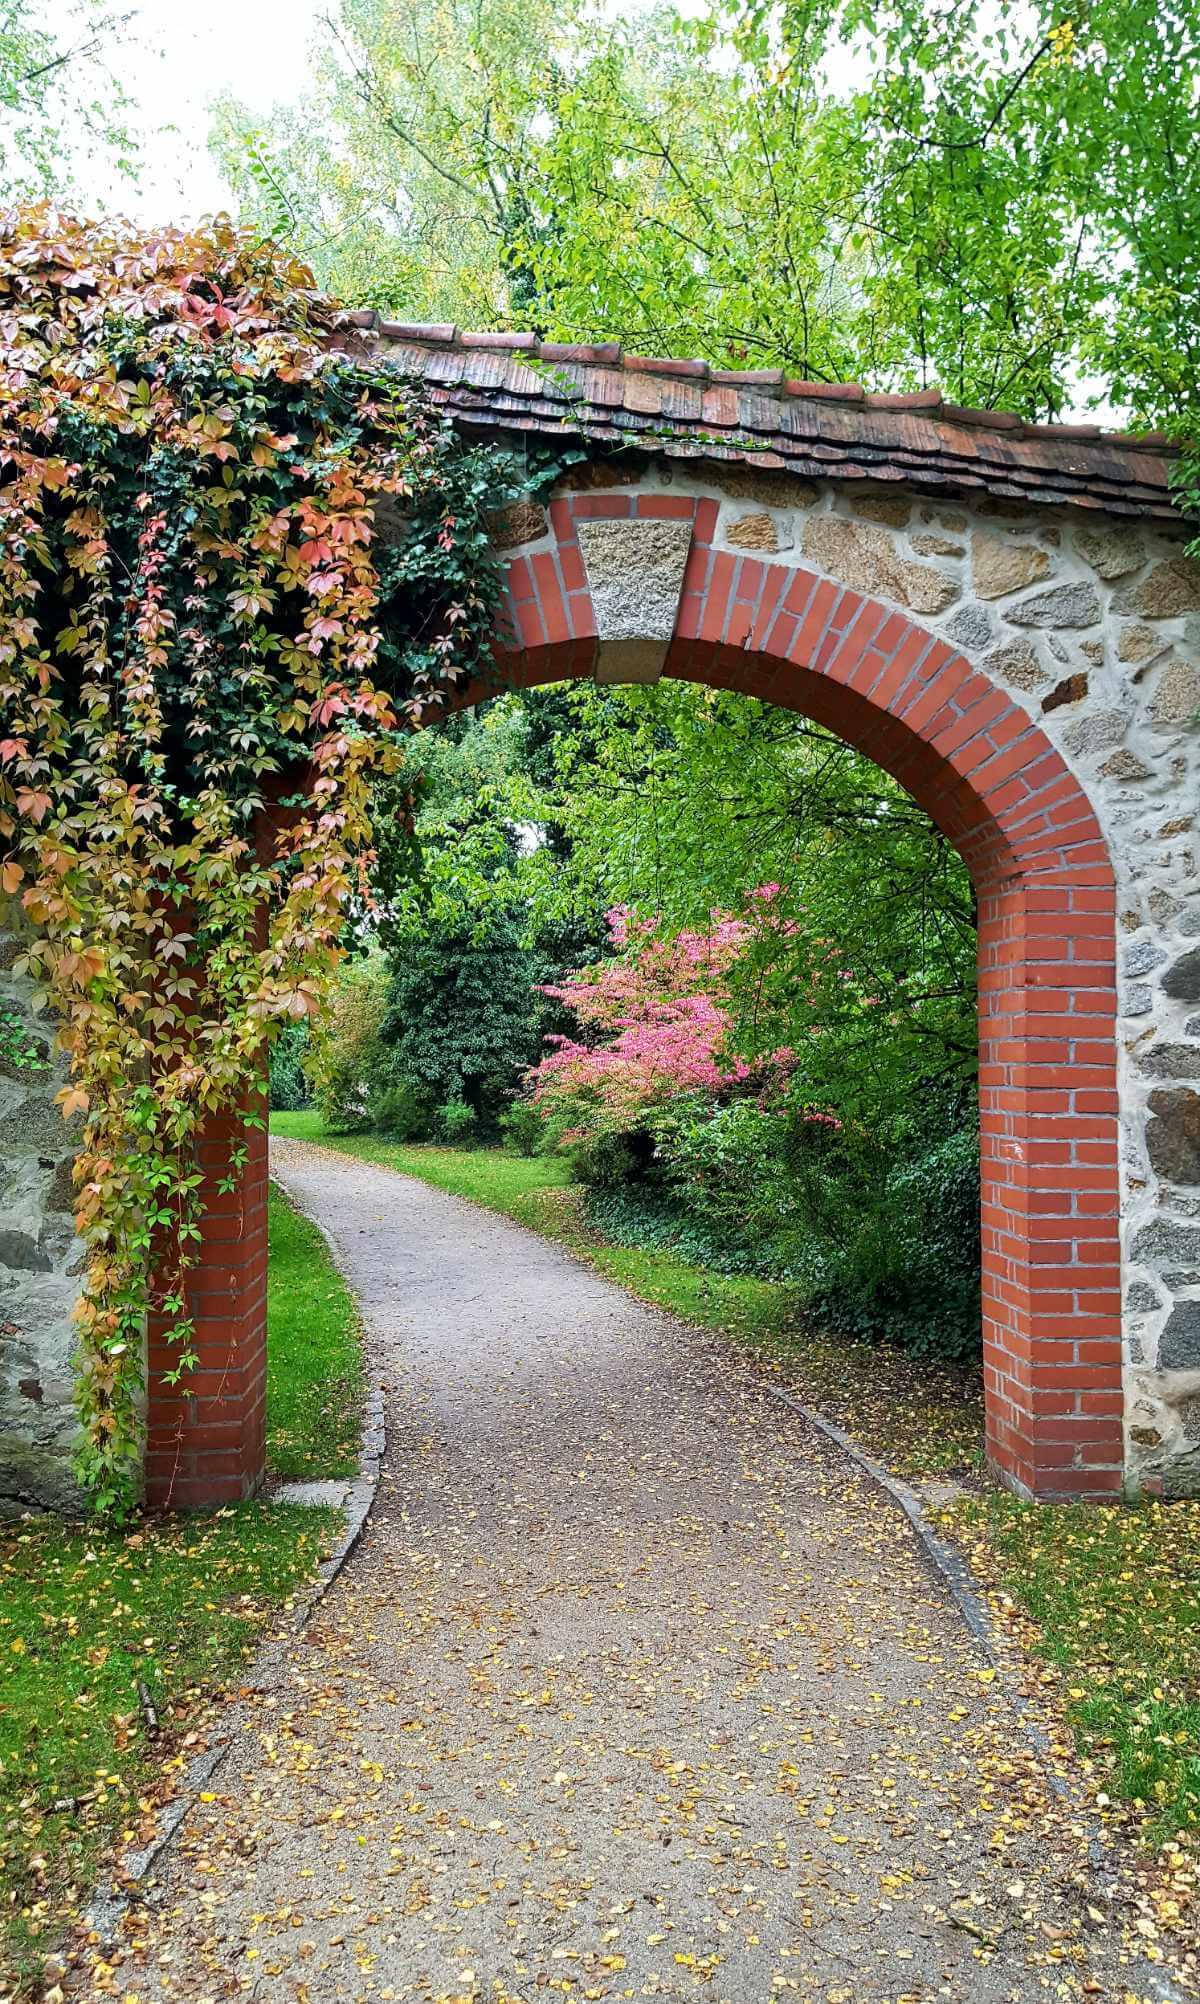 Oder Neiße Spree_city-garden-görlitz_pixabay